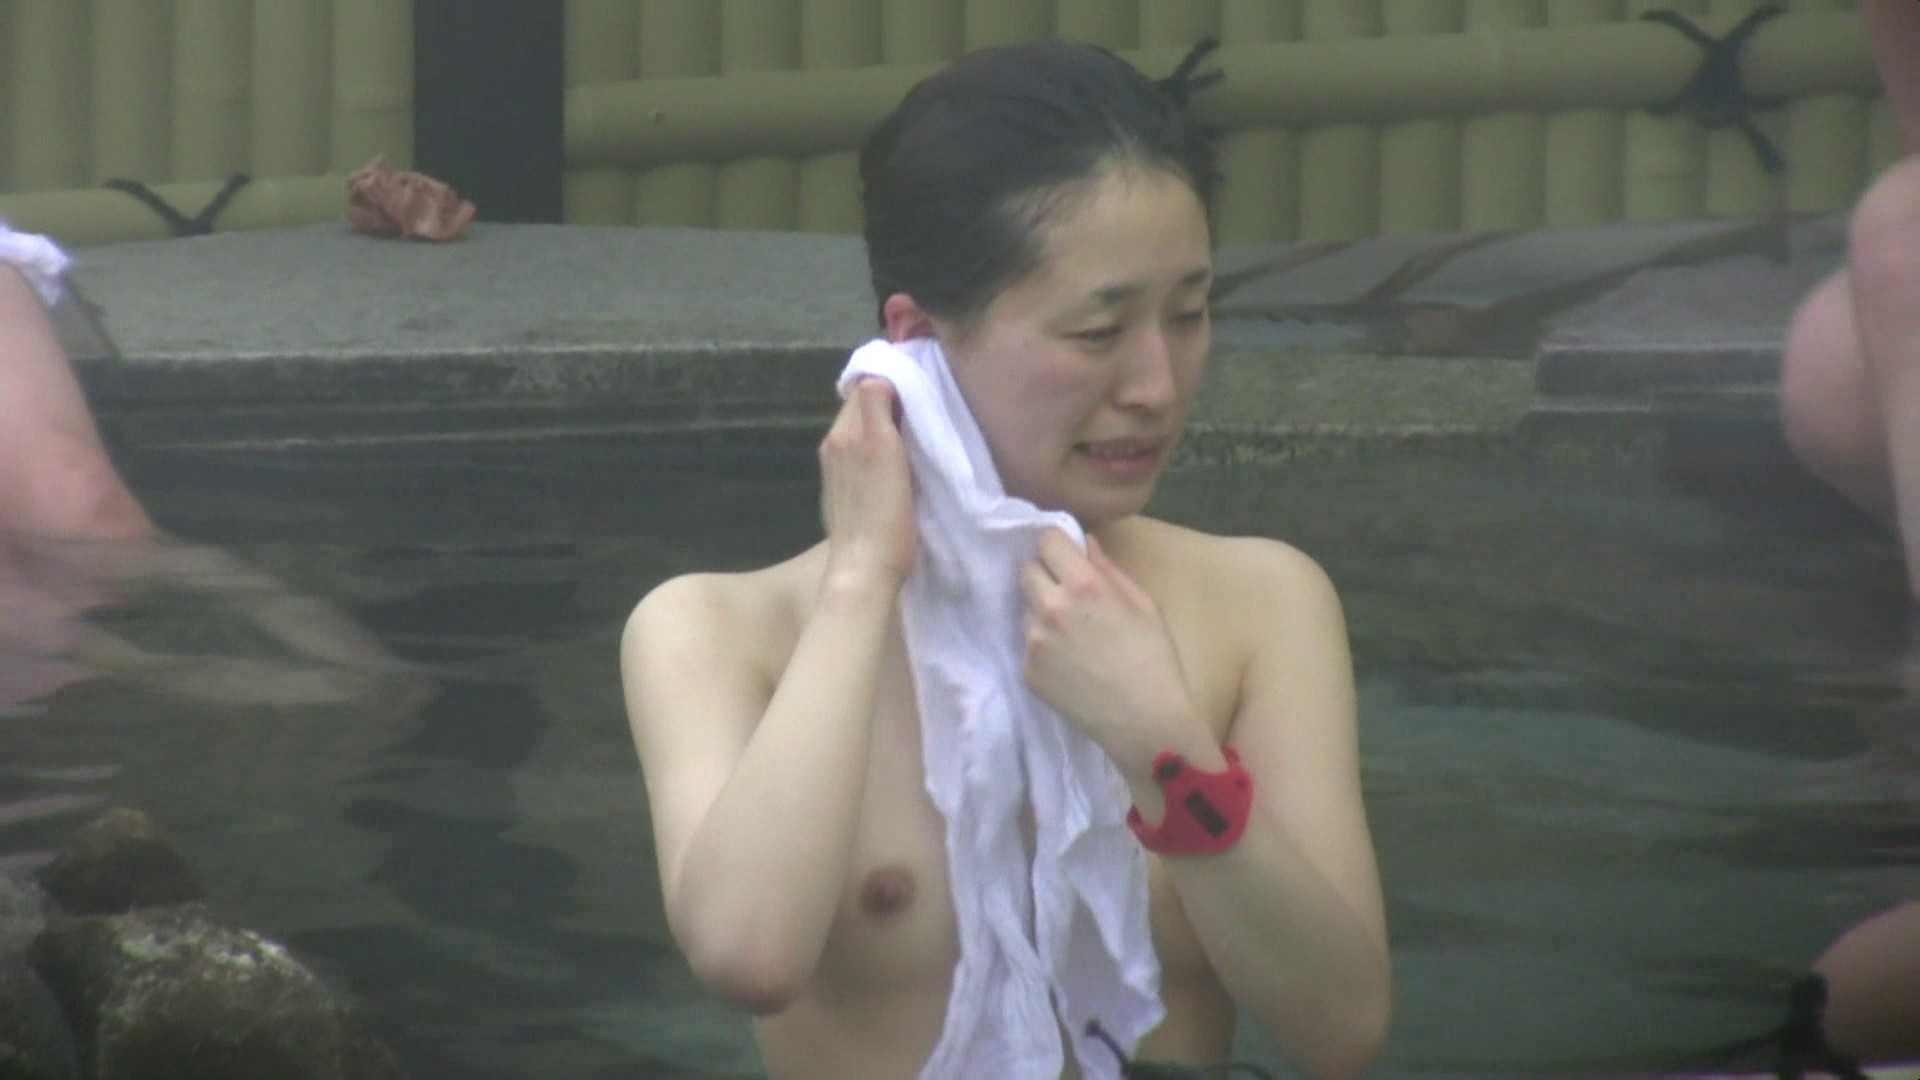 Aquaな露天風呂Vol.583 美しいOLの裸体 すけべAV動画紹介 103pic 38